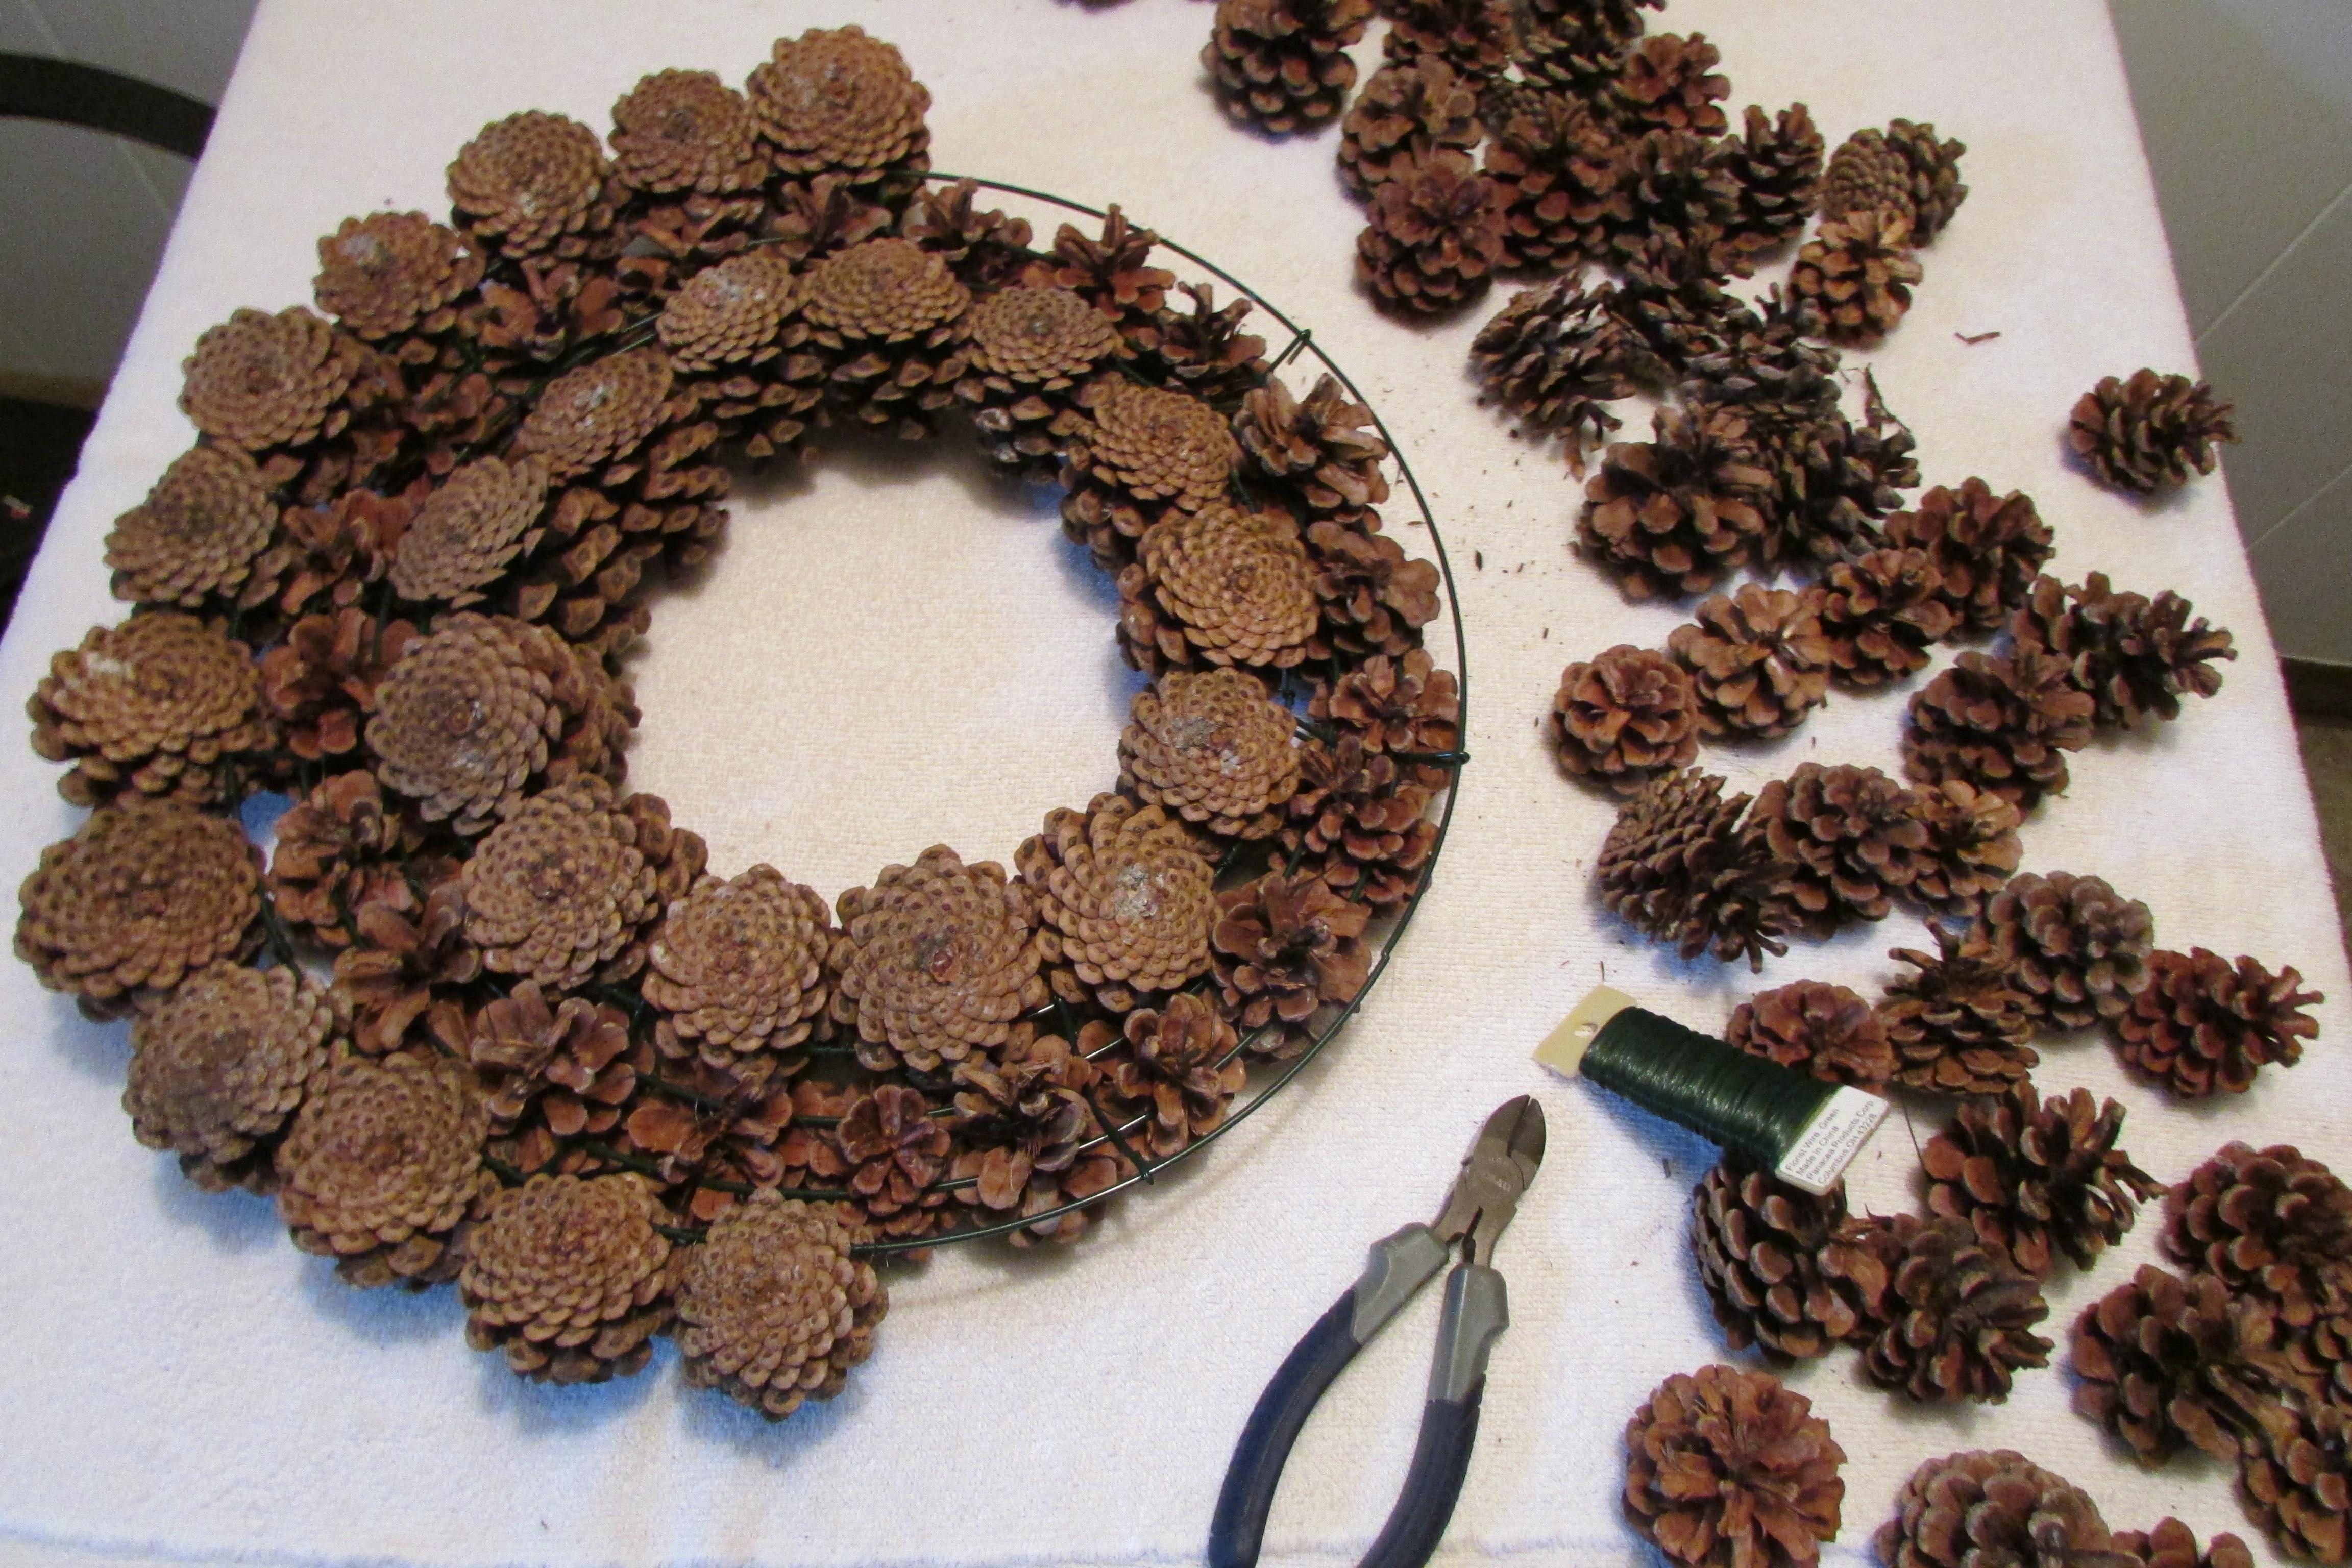 How To Make A Pine Cone Christmas Wreath